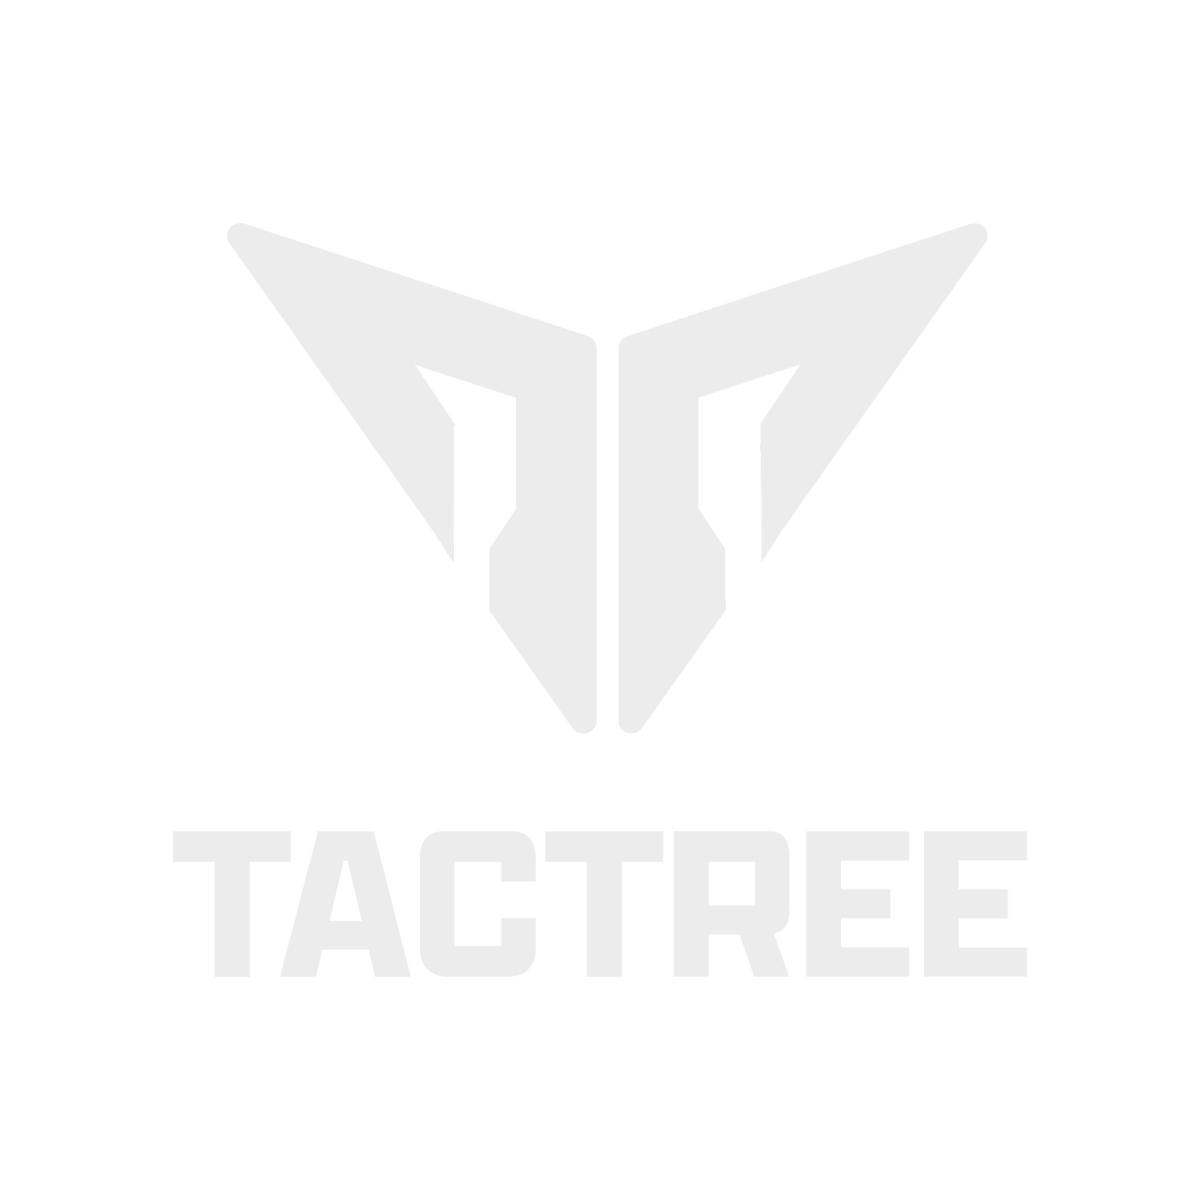 5.11 MultiCam XPRT Tactical Trousers